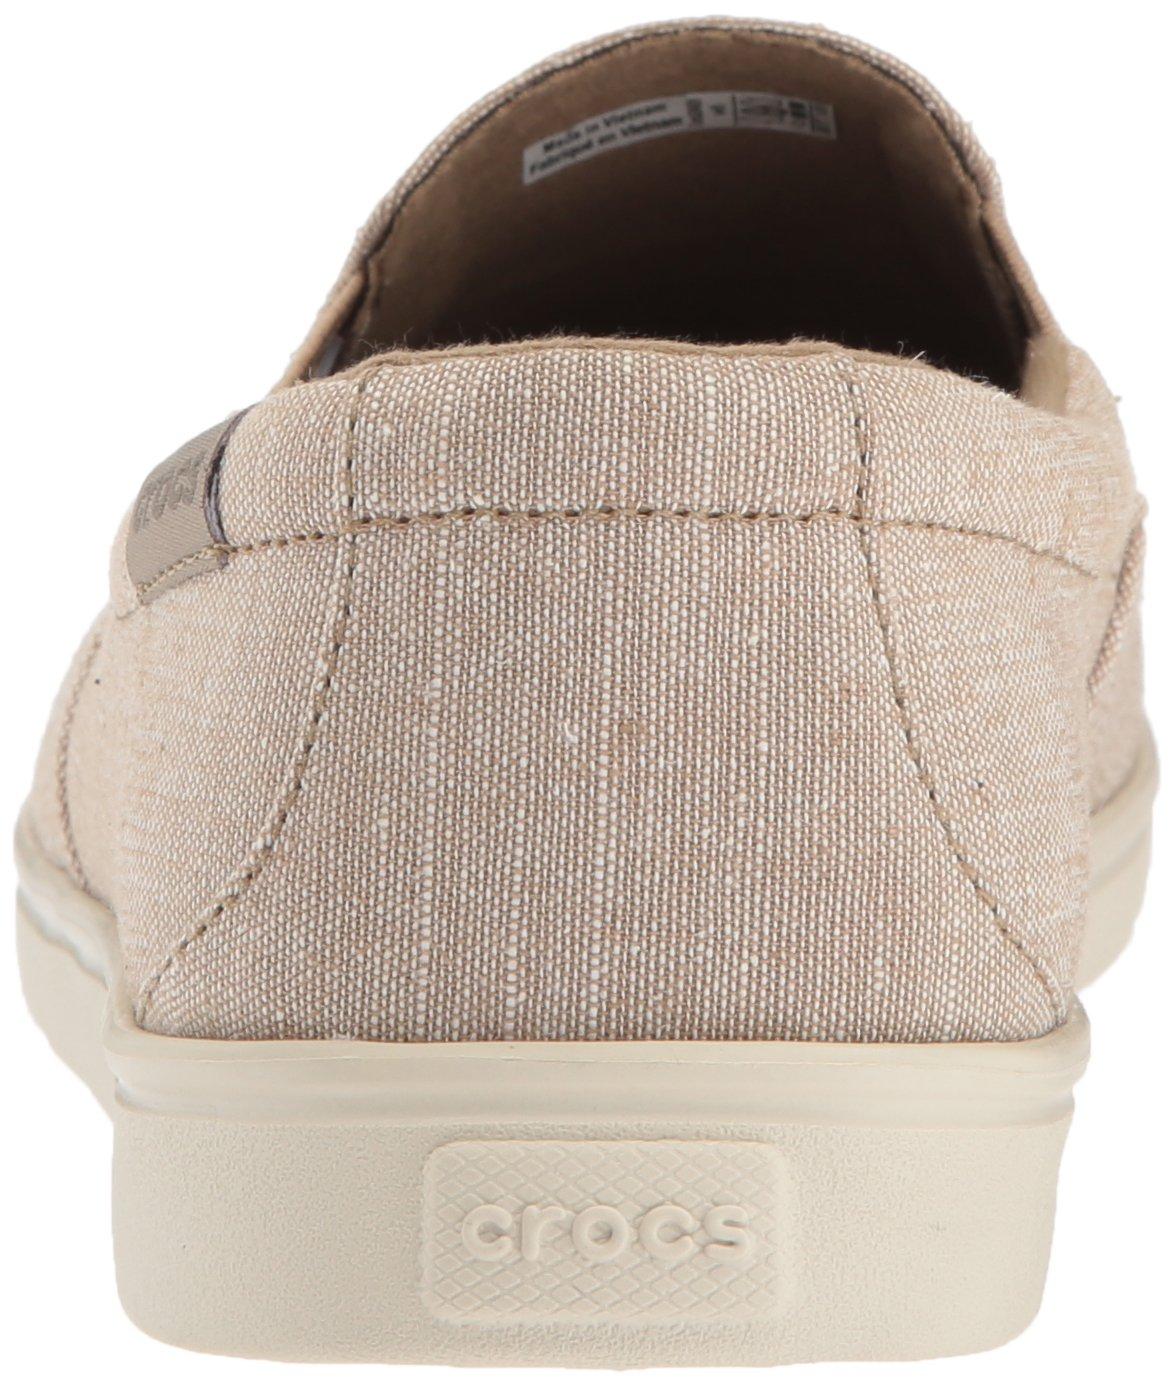 Crocs Women's Citilane Low Canvas Slip-On B071WCWT5J 9 B(M) US|Khaki